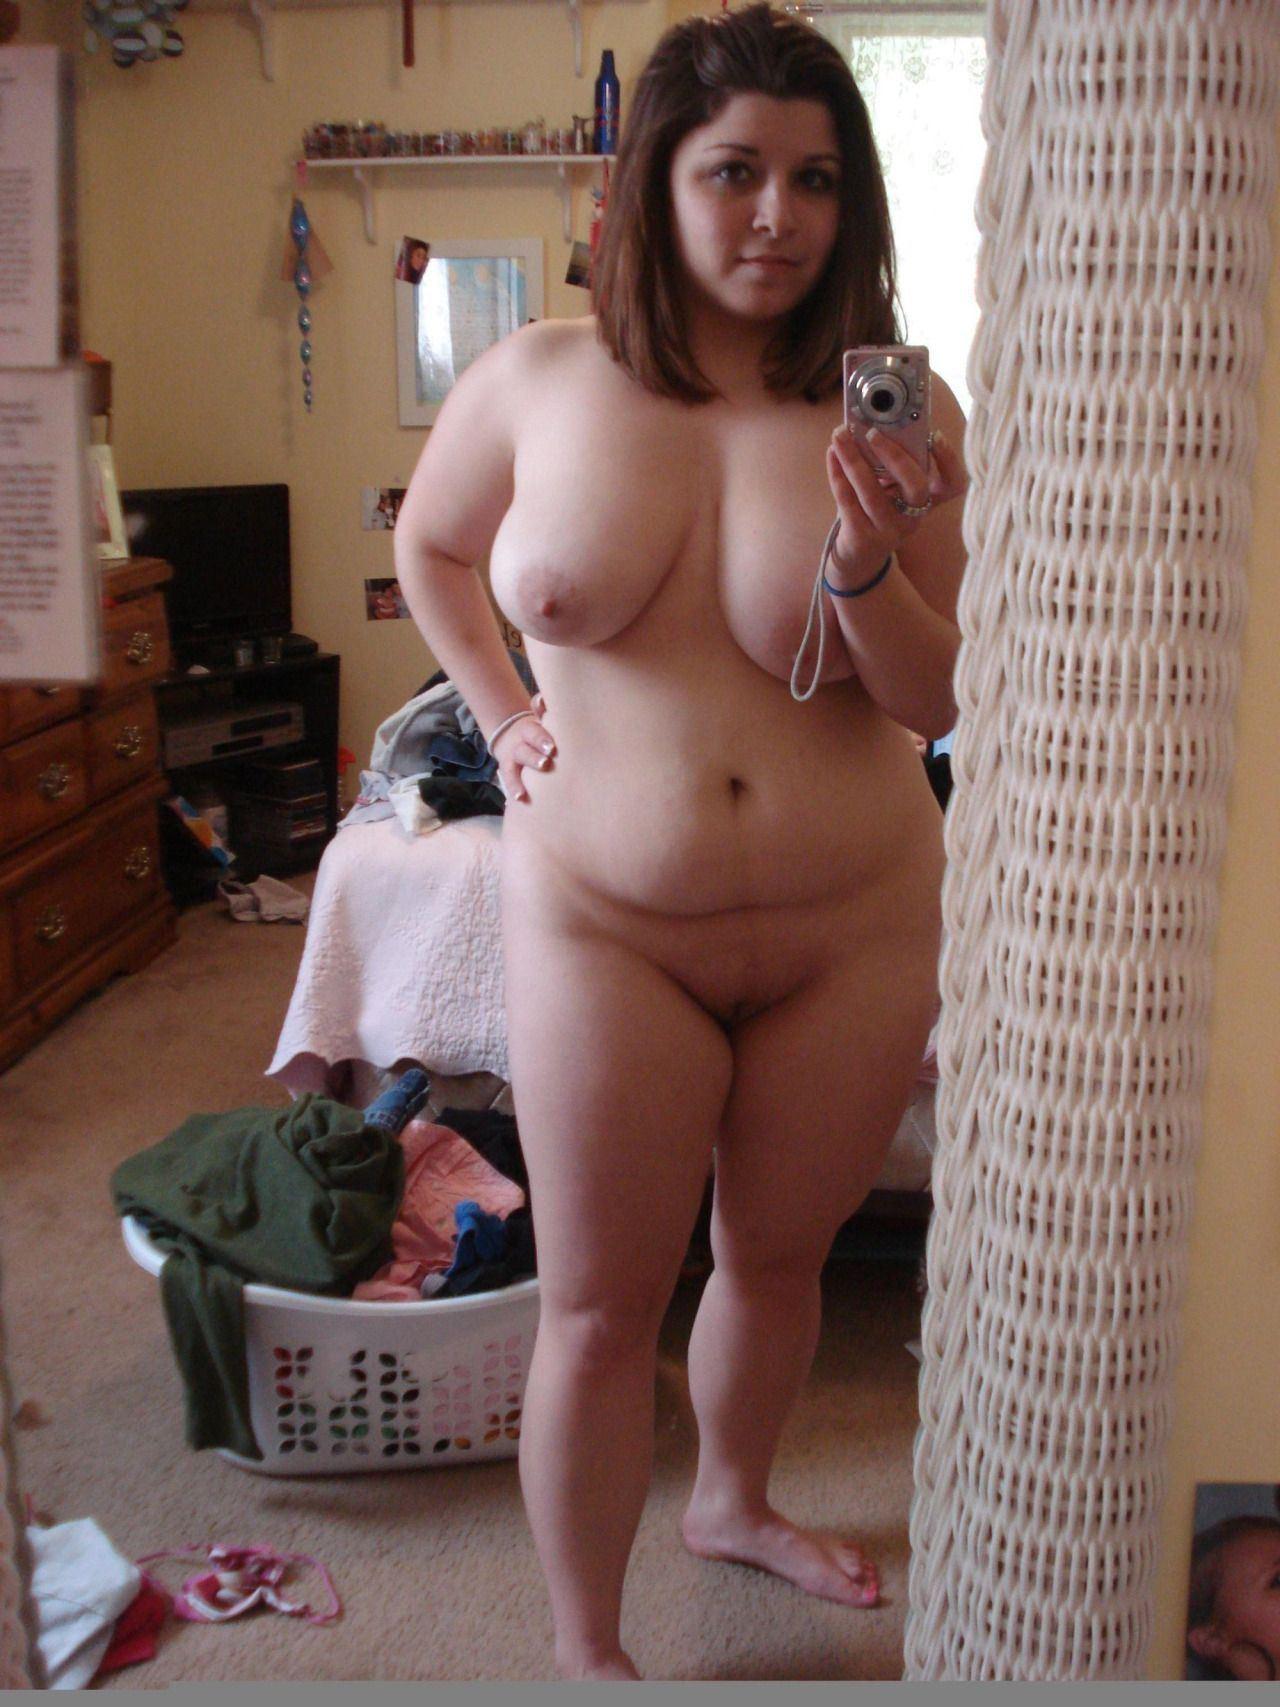 Girls naked photos nude short